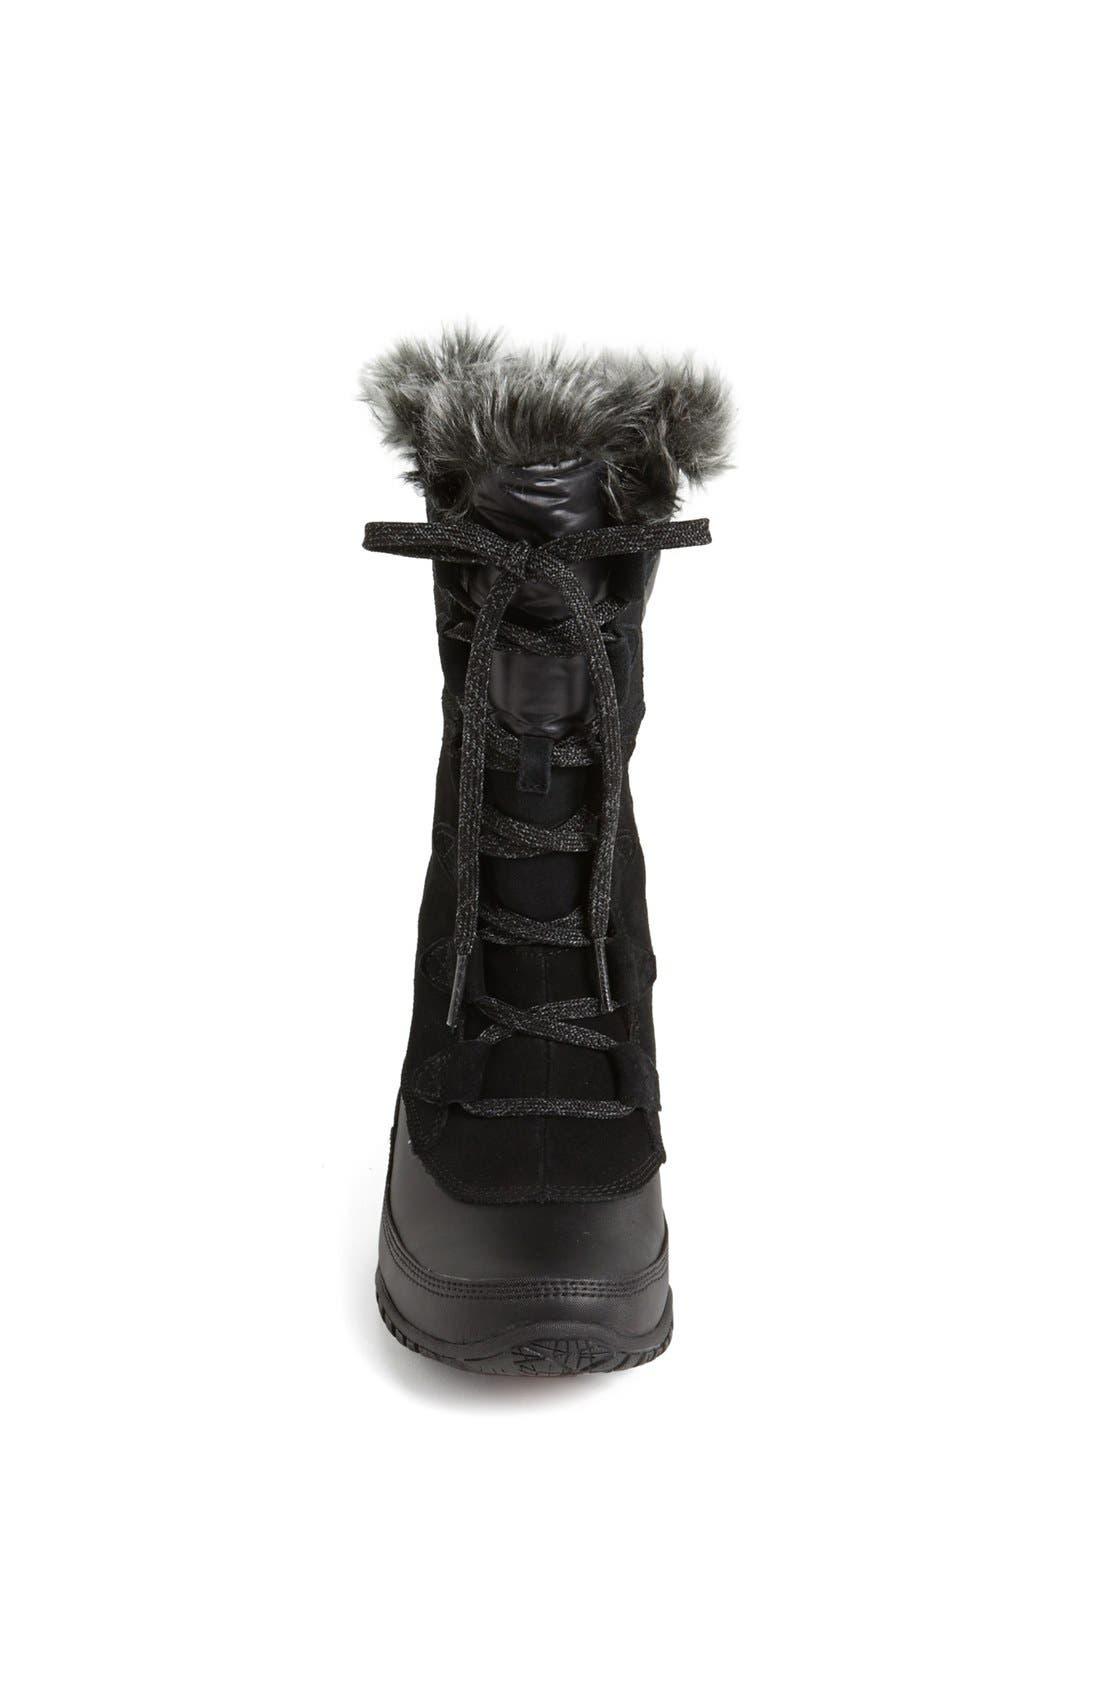 'Nuptse Purna' Waterproof PrimaLoft<sup>®</sup> Eco Insulated Winter Boot,                             Alternate thumbnail 3, color,                             001